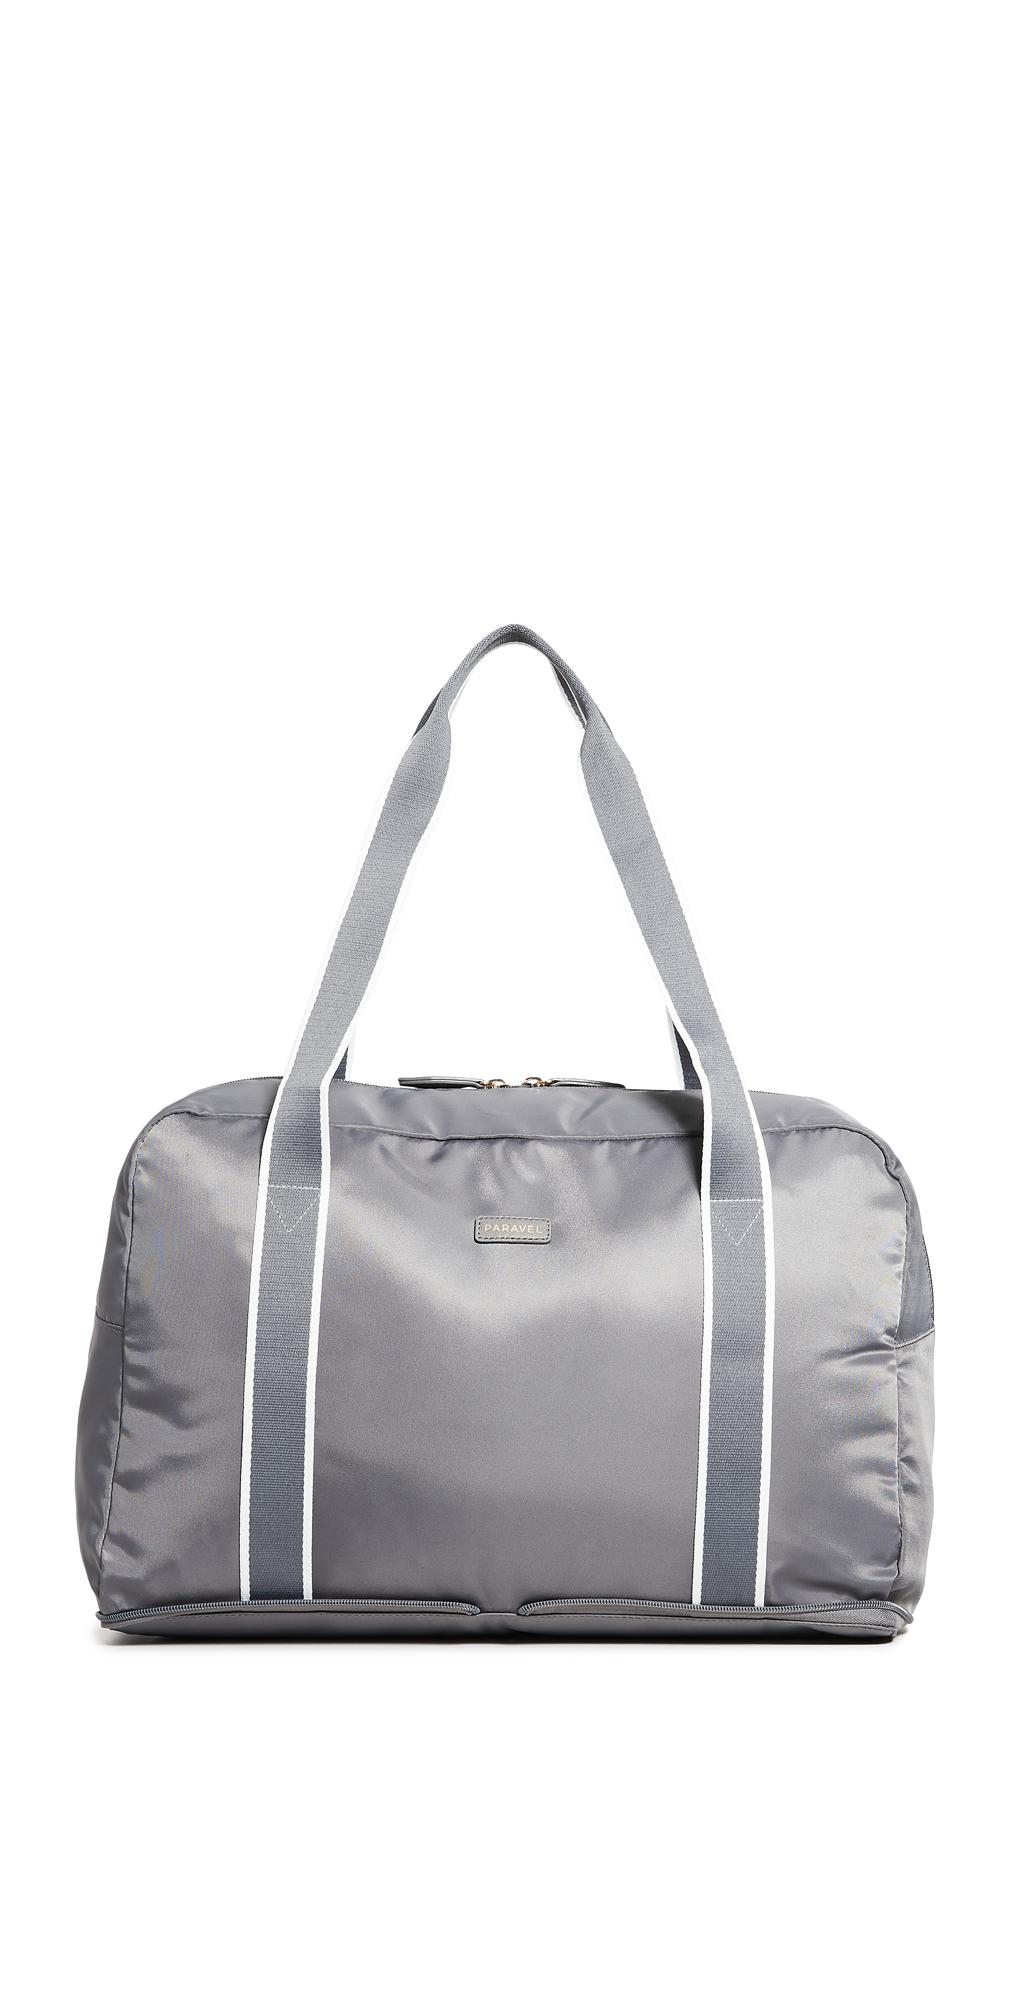 Paravel Fold Up Duffel Bag